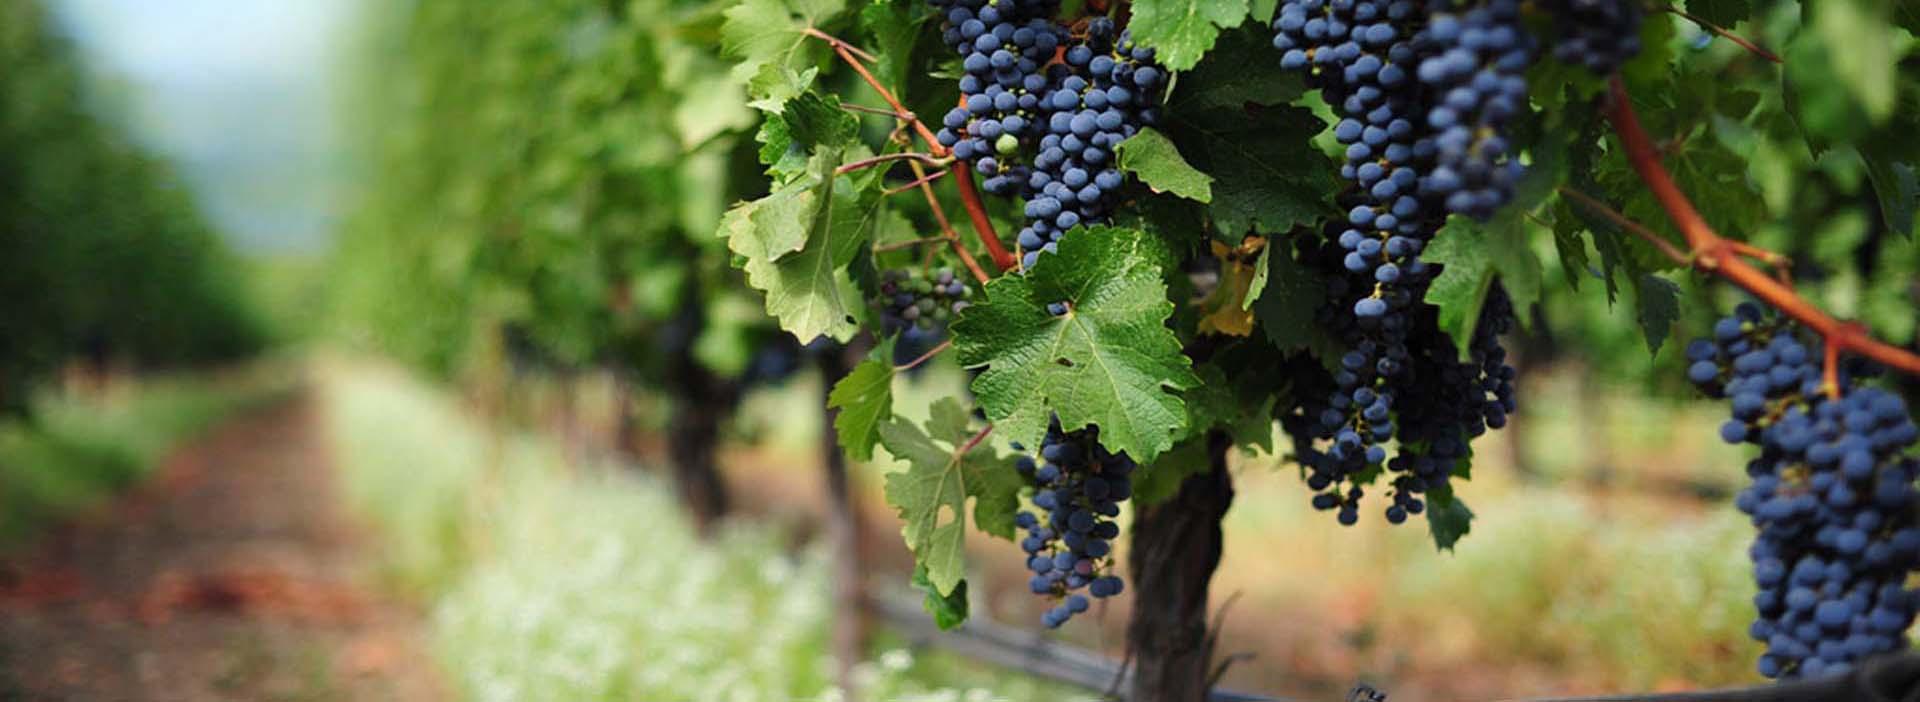 le due torri italian winery